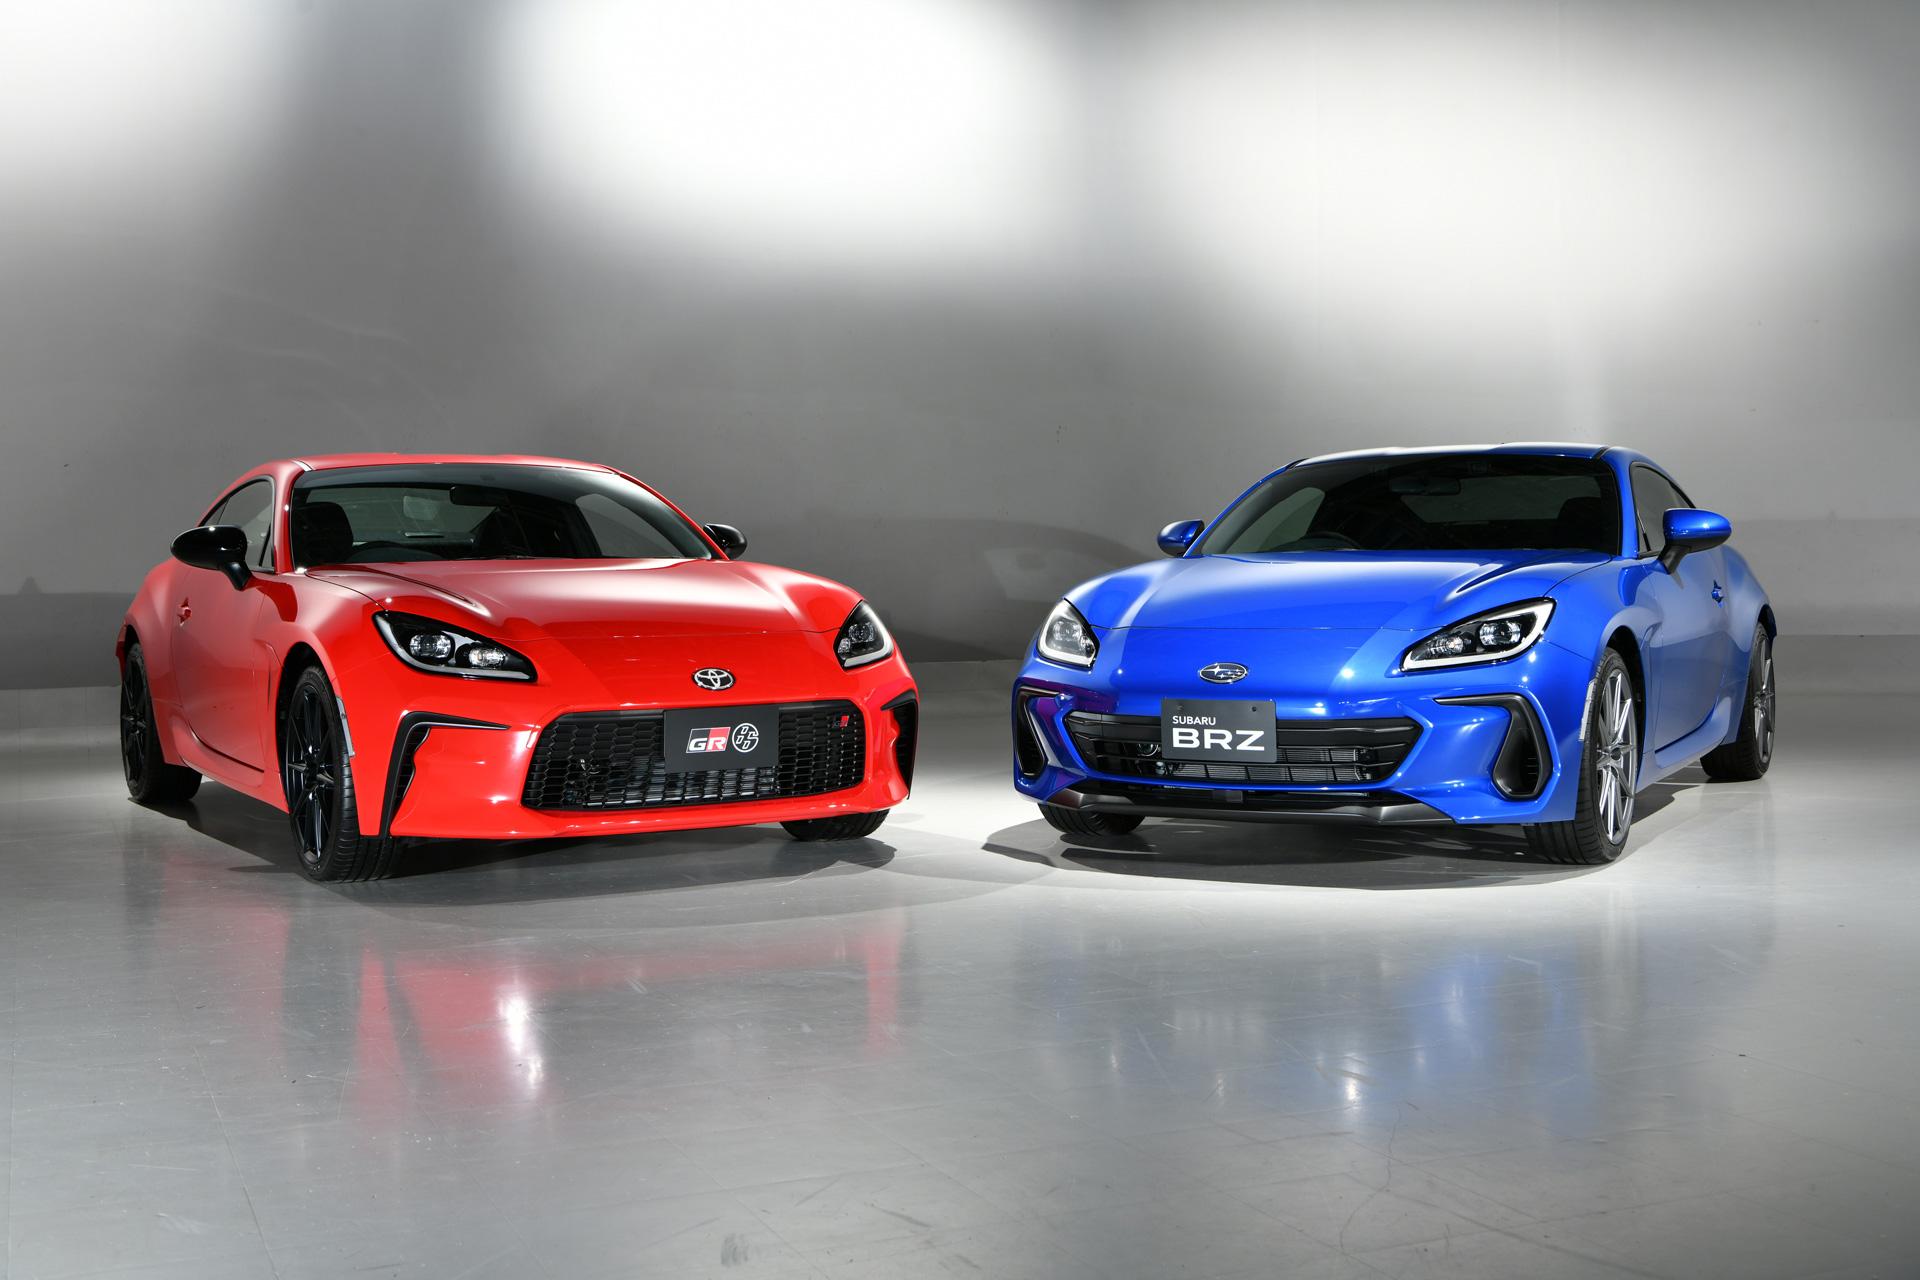 2021 Toyota GR 86 vs Subaru BRZ